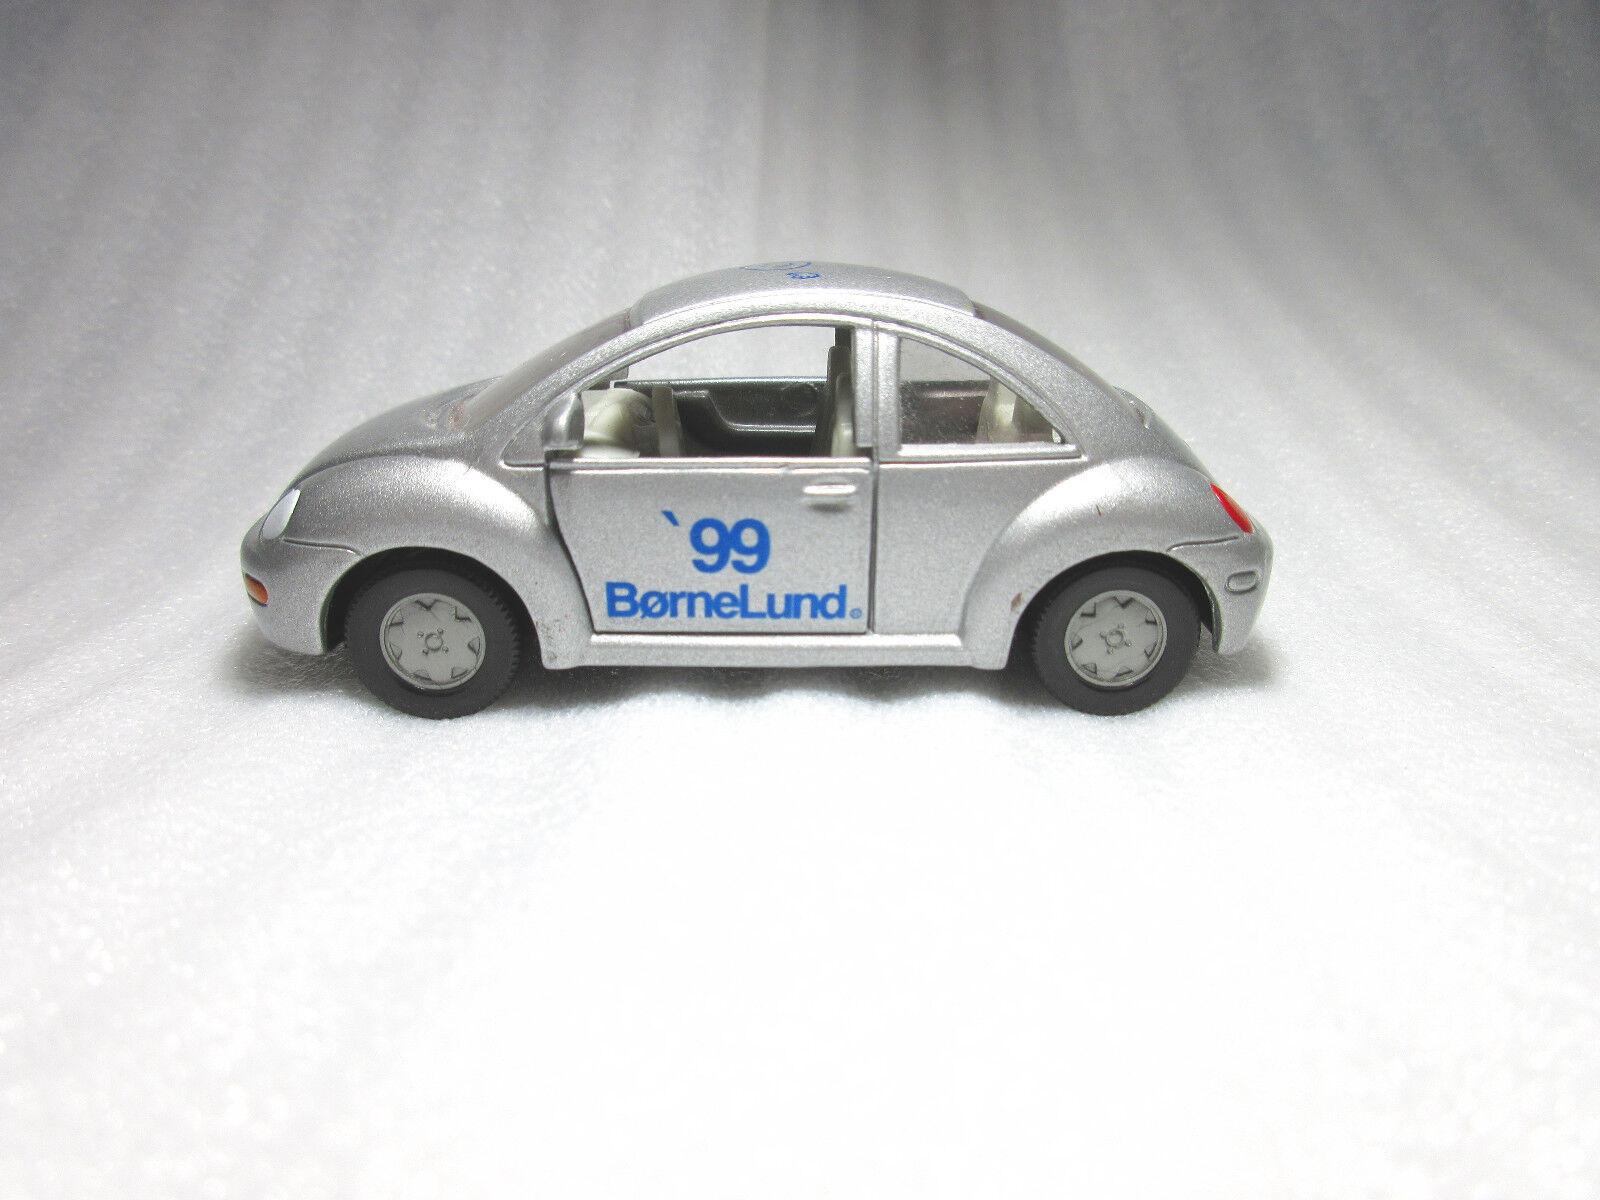 Siku Vw Volkswagen Nuevo Escarabajo plata bornelund 1999 exclusivo Diecast RARE PROMO